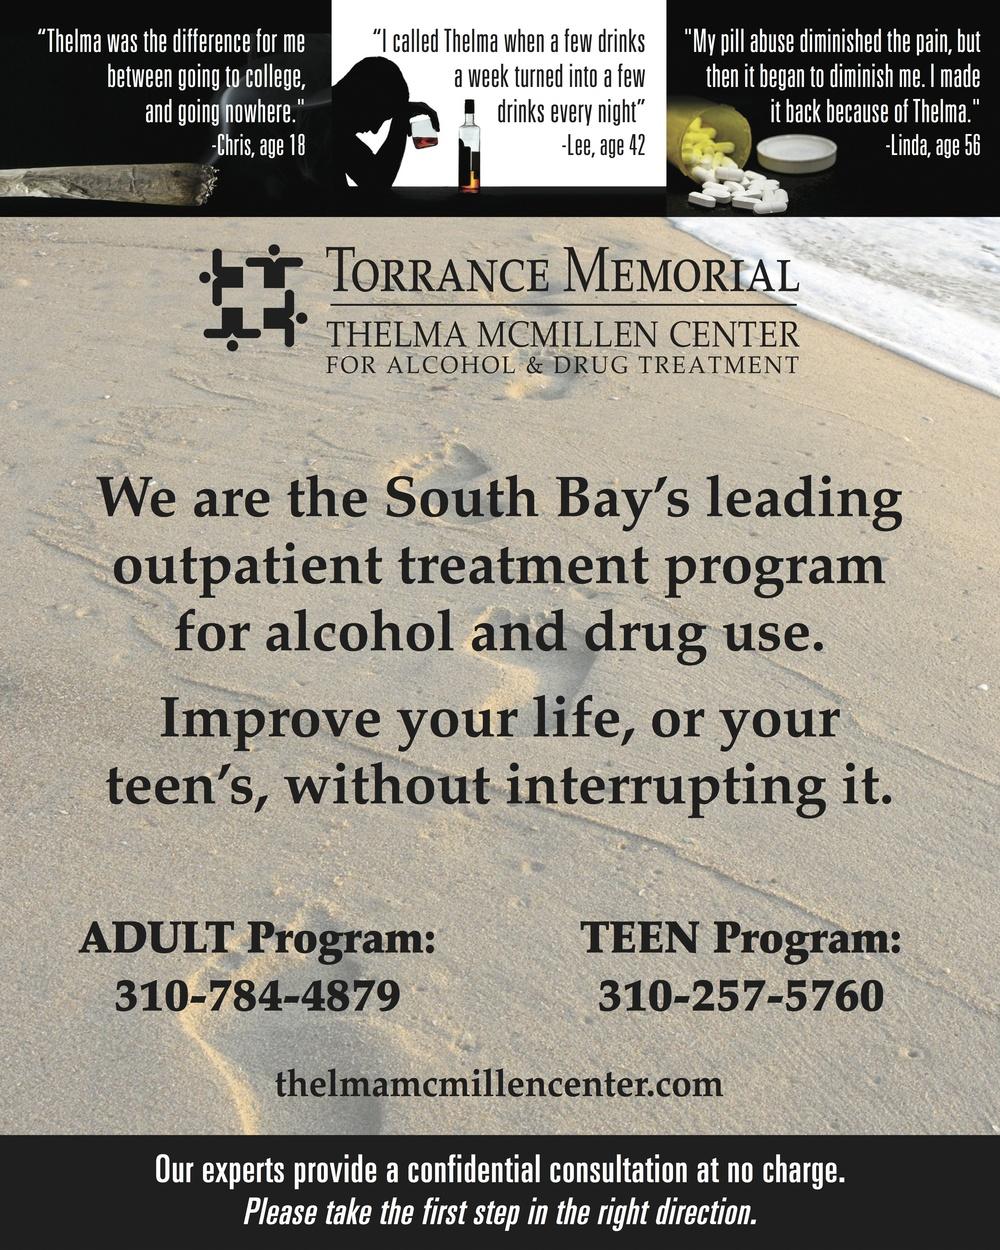 mcmillen-center-drug-alcohol-abuse